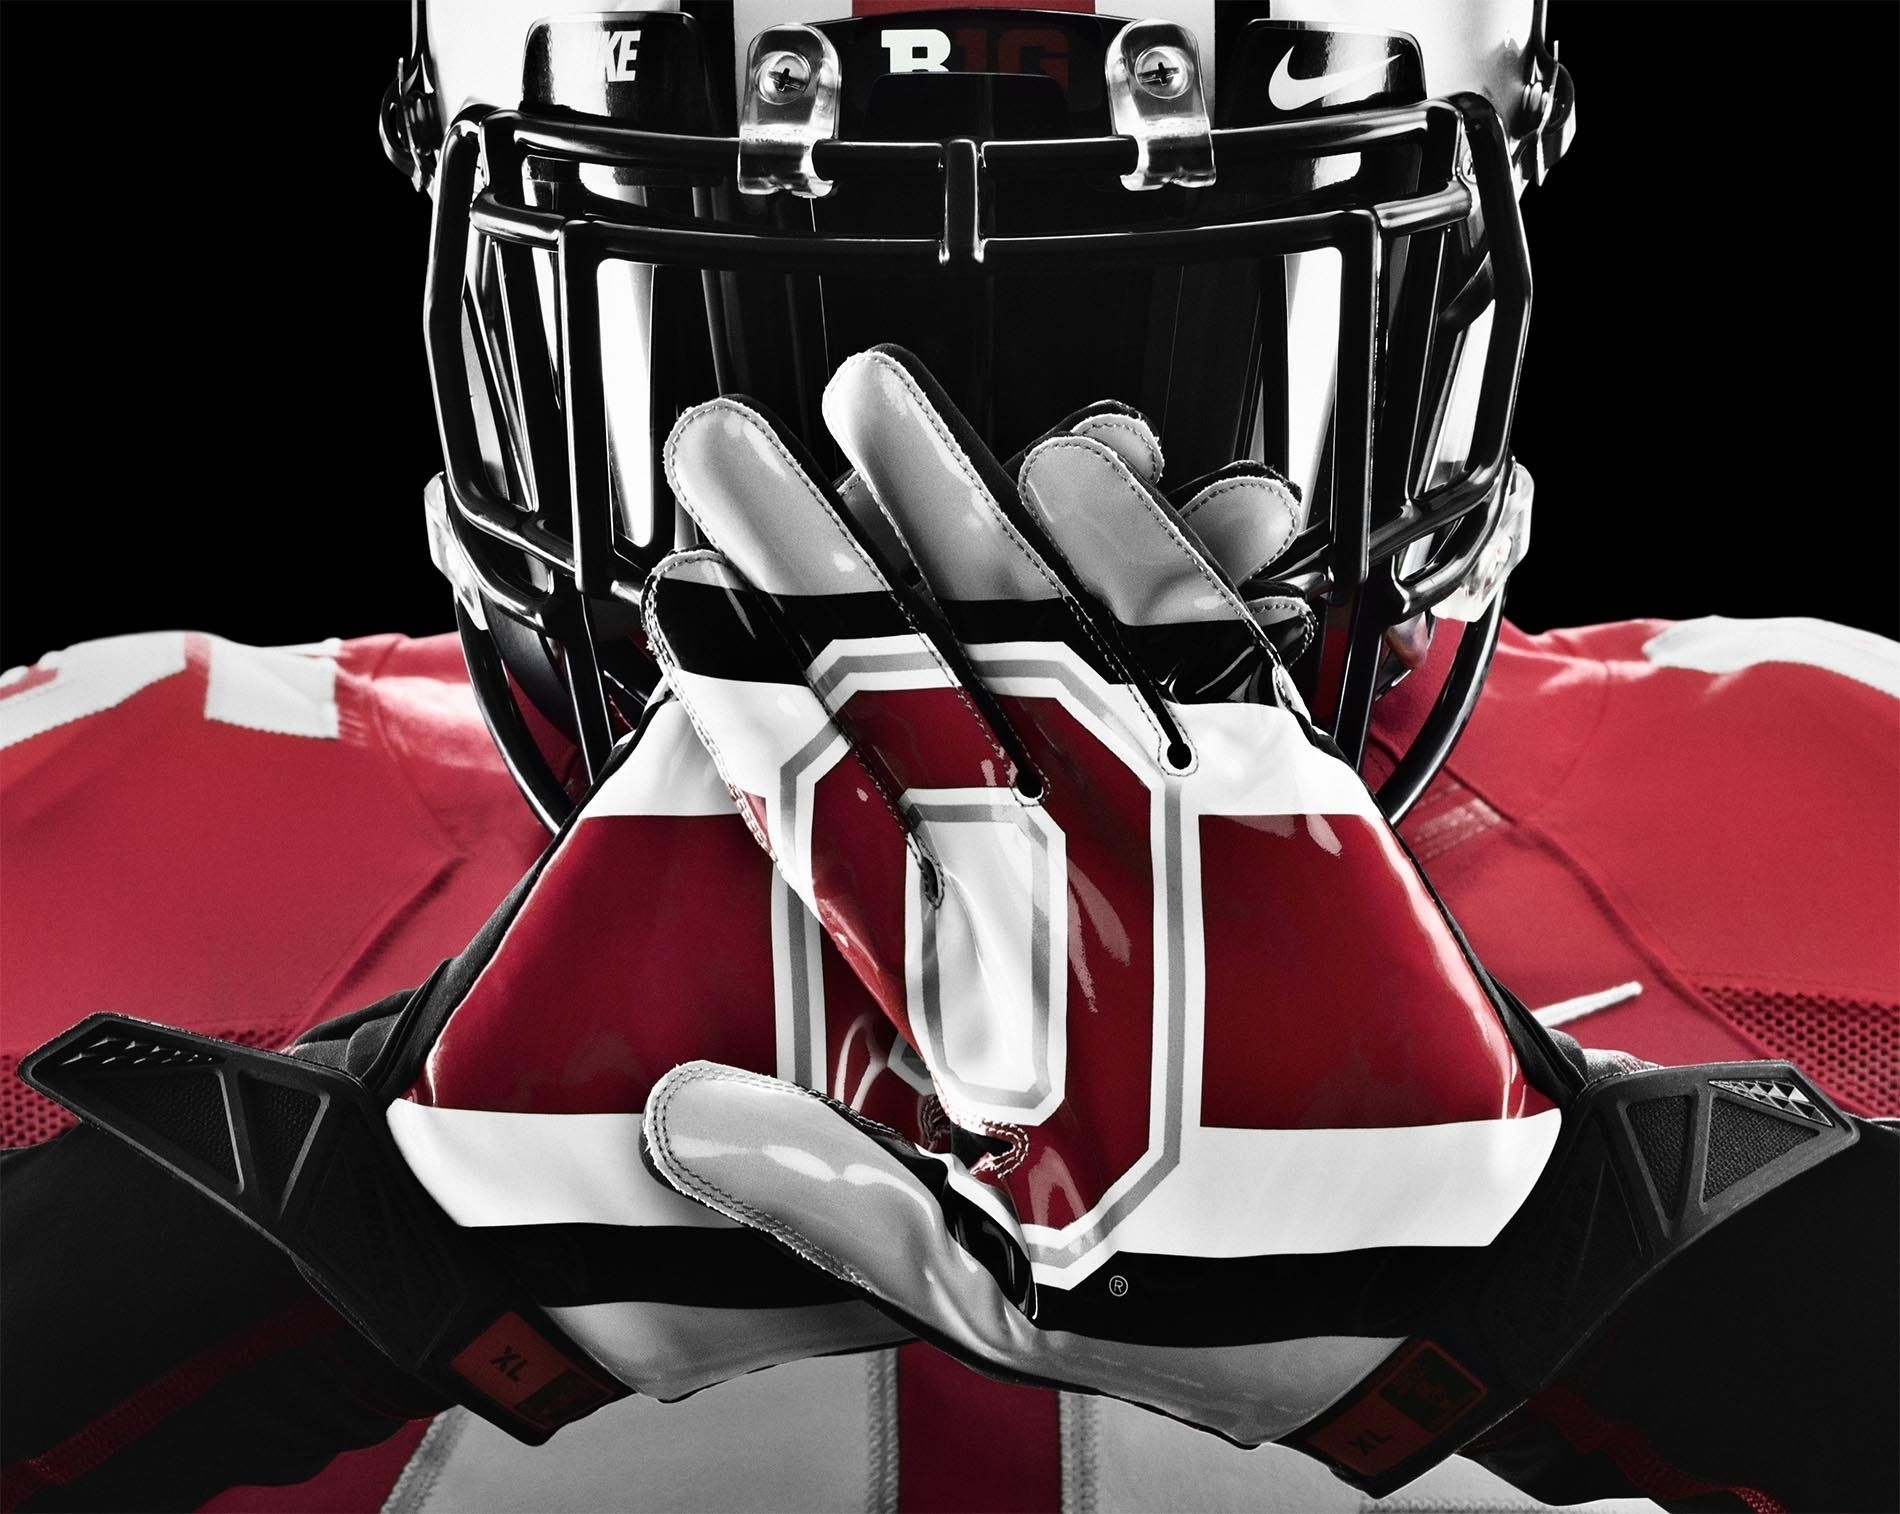 ohio state buckeyes wallpaper | ohio state buckeyes college football